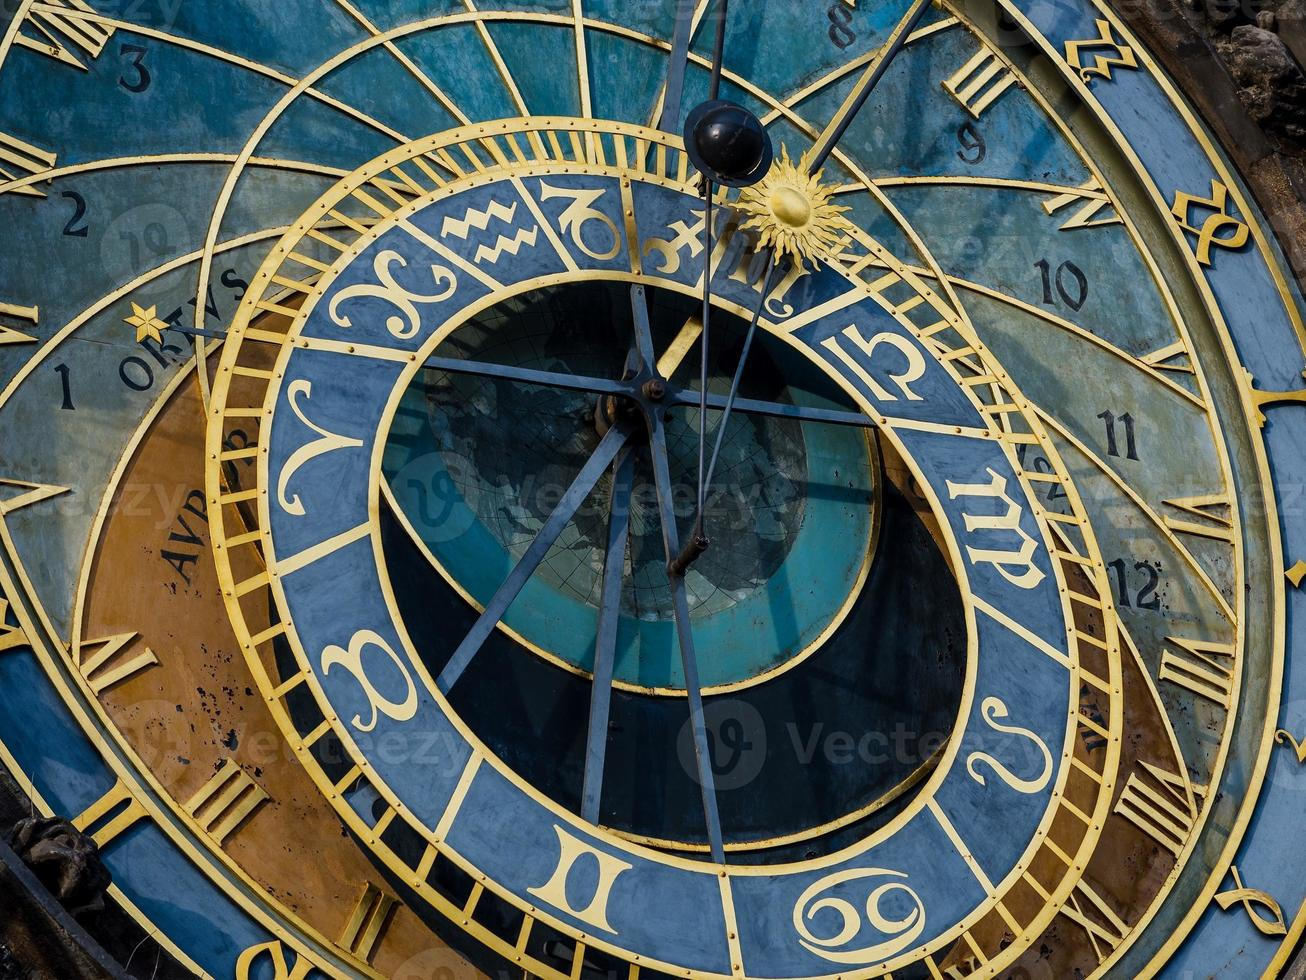 Prague Astronomical Clock (Orloj) in the Old Town of Prague photo